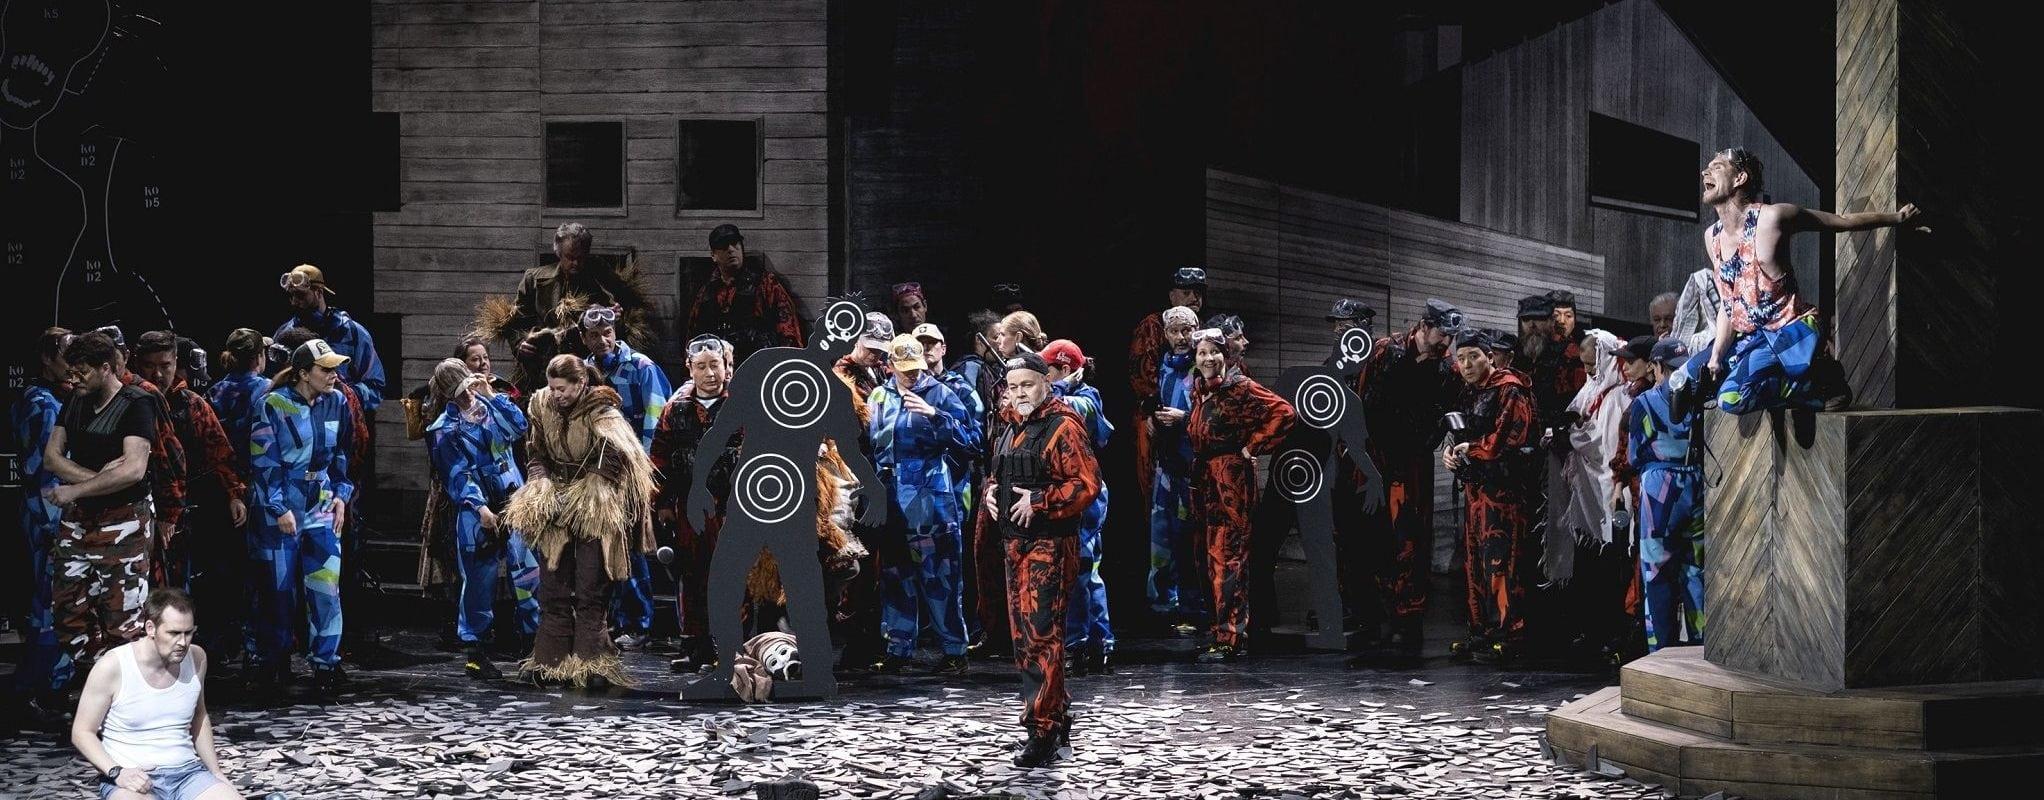 Der Freischütz, l'opéra mythique, modernisé à Strasbourg